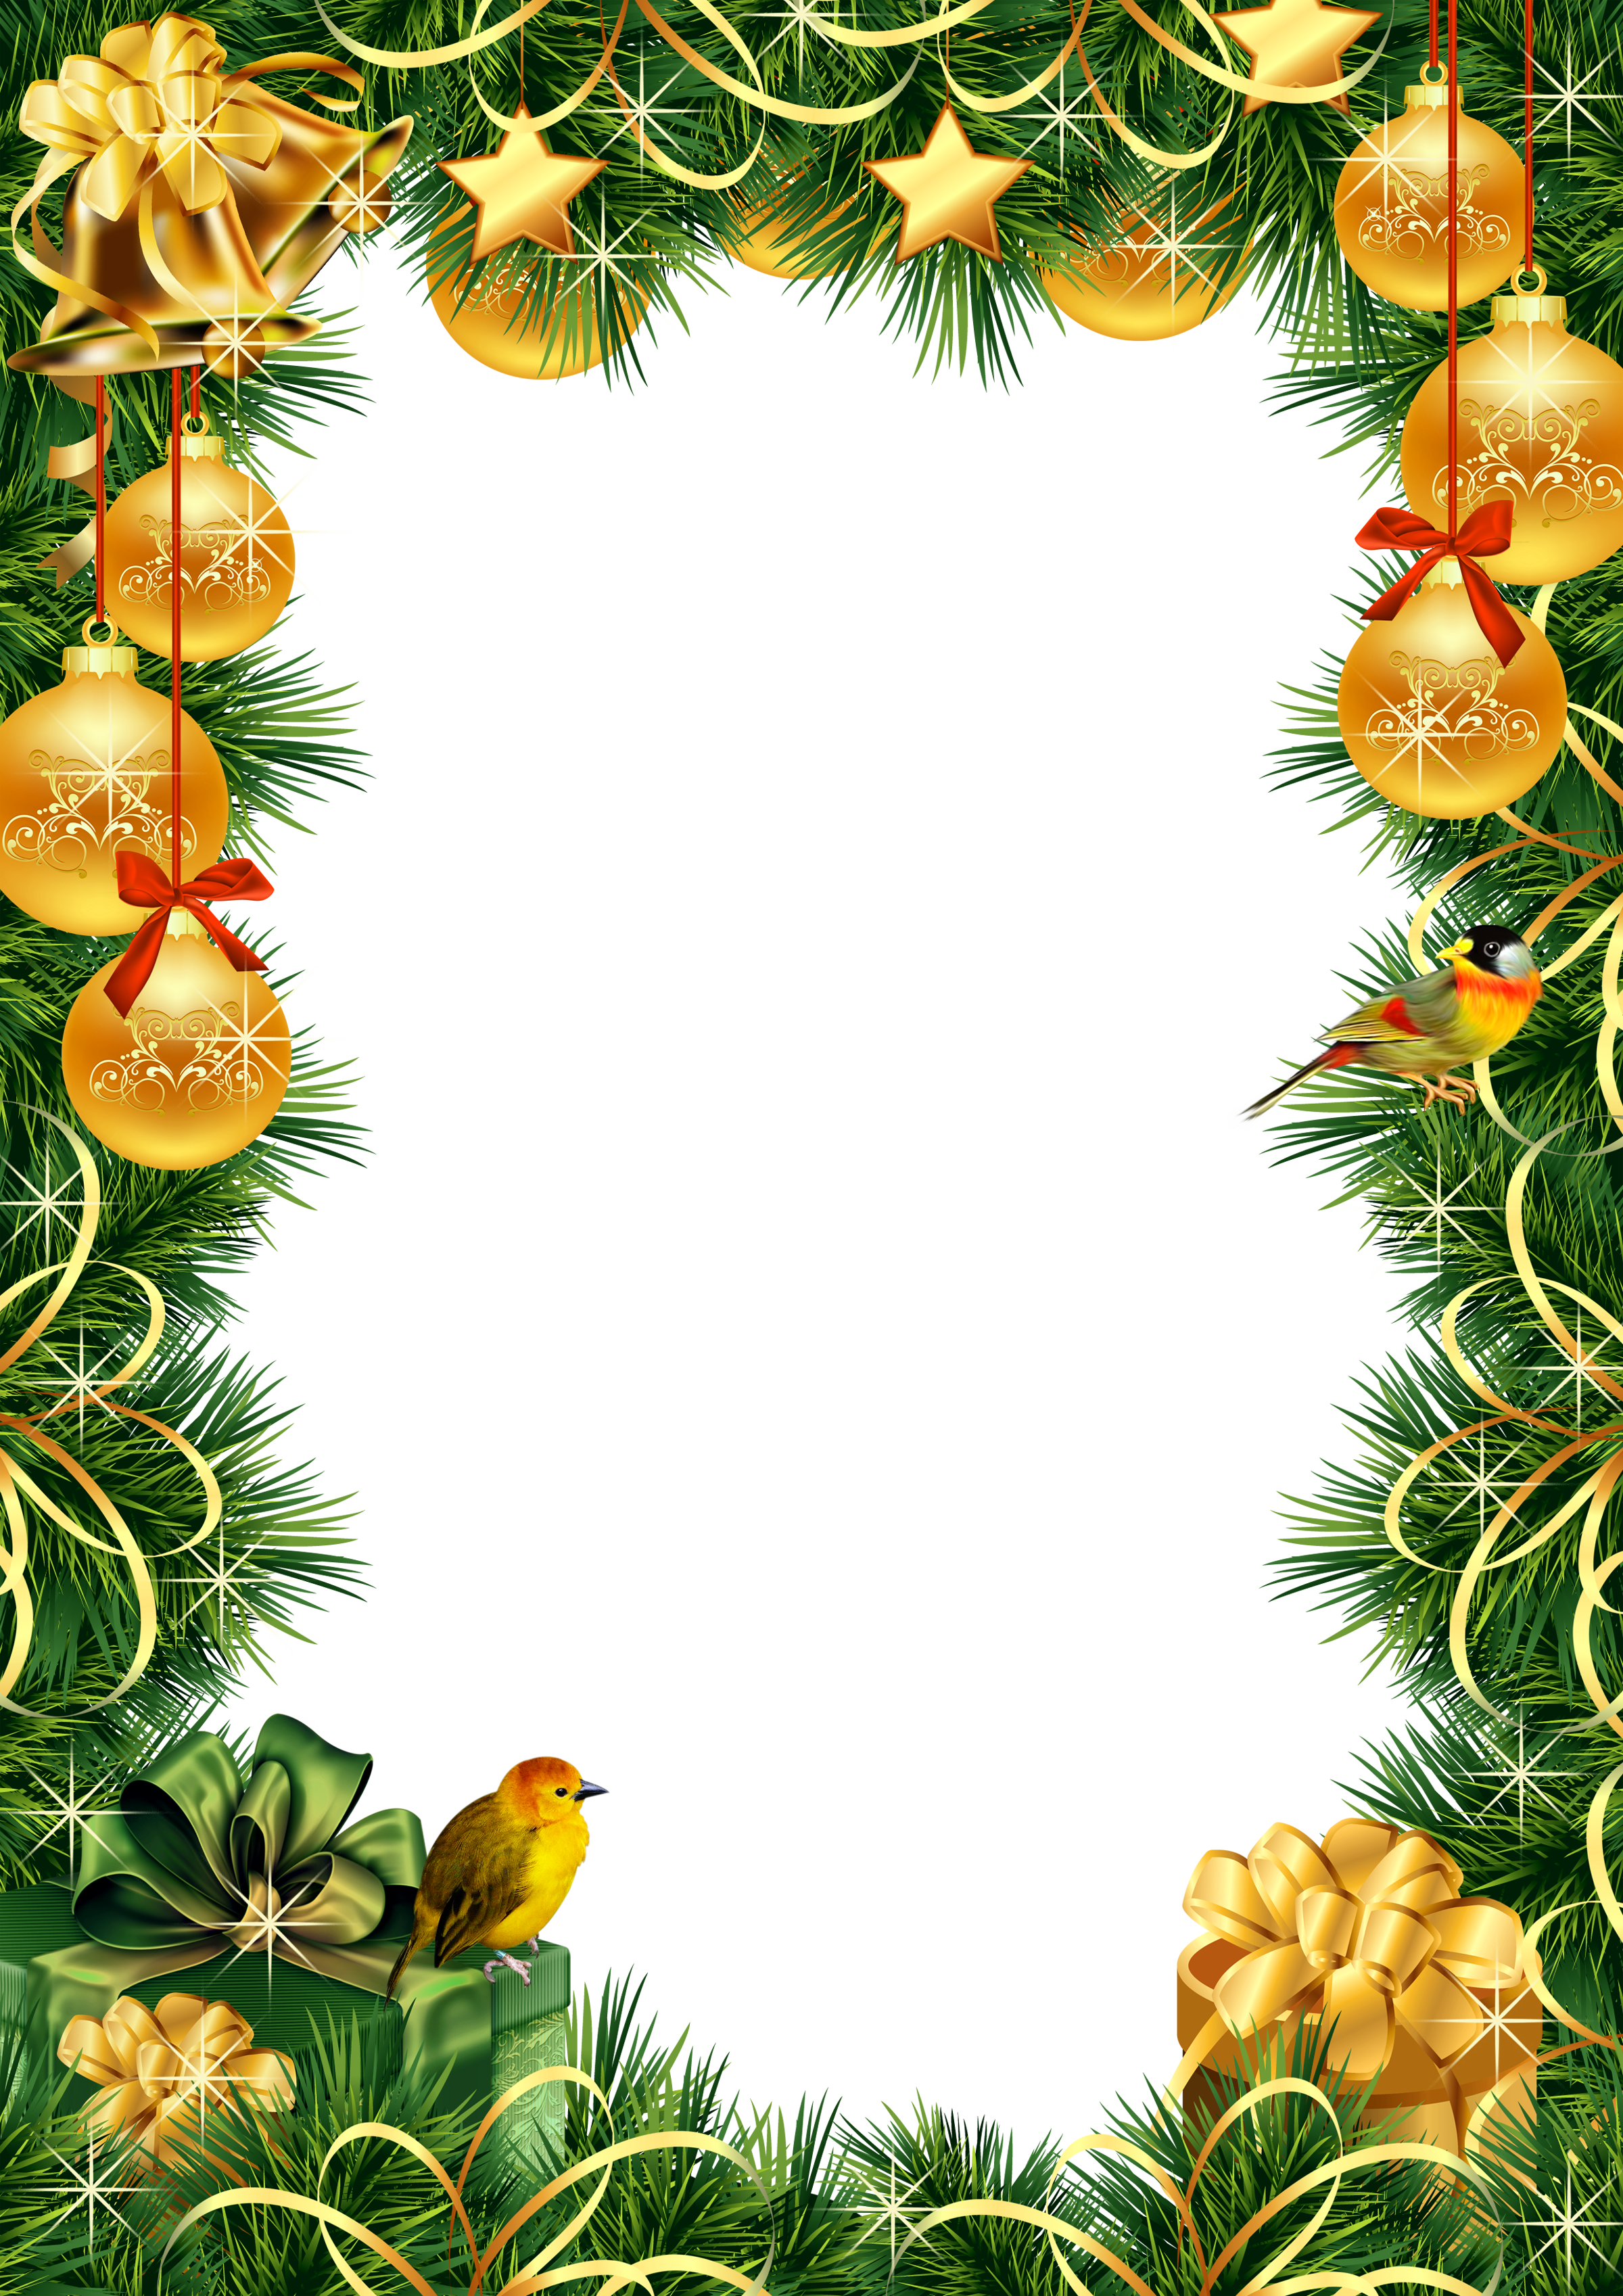 christmas frame transparent - Google Search | frames | Pinterest ...